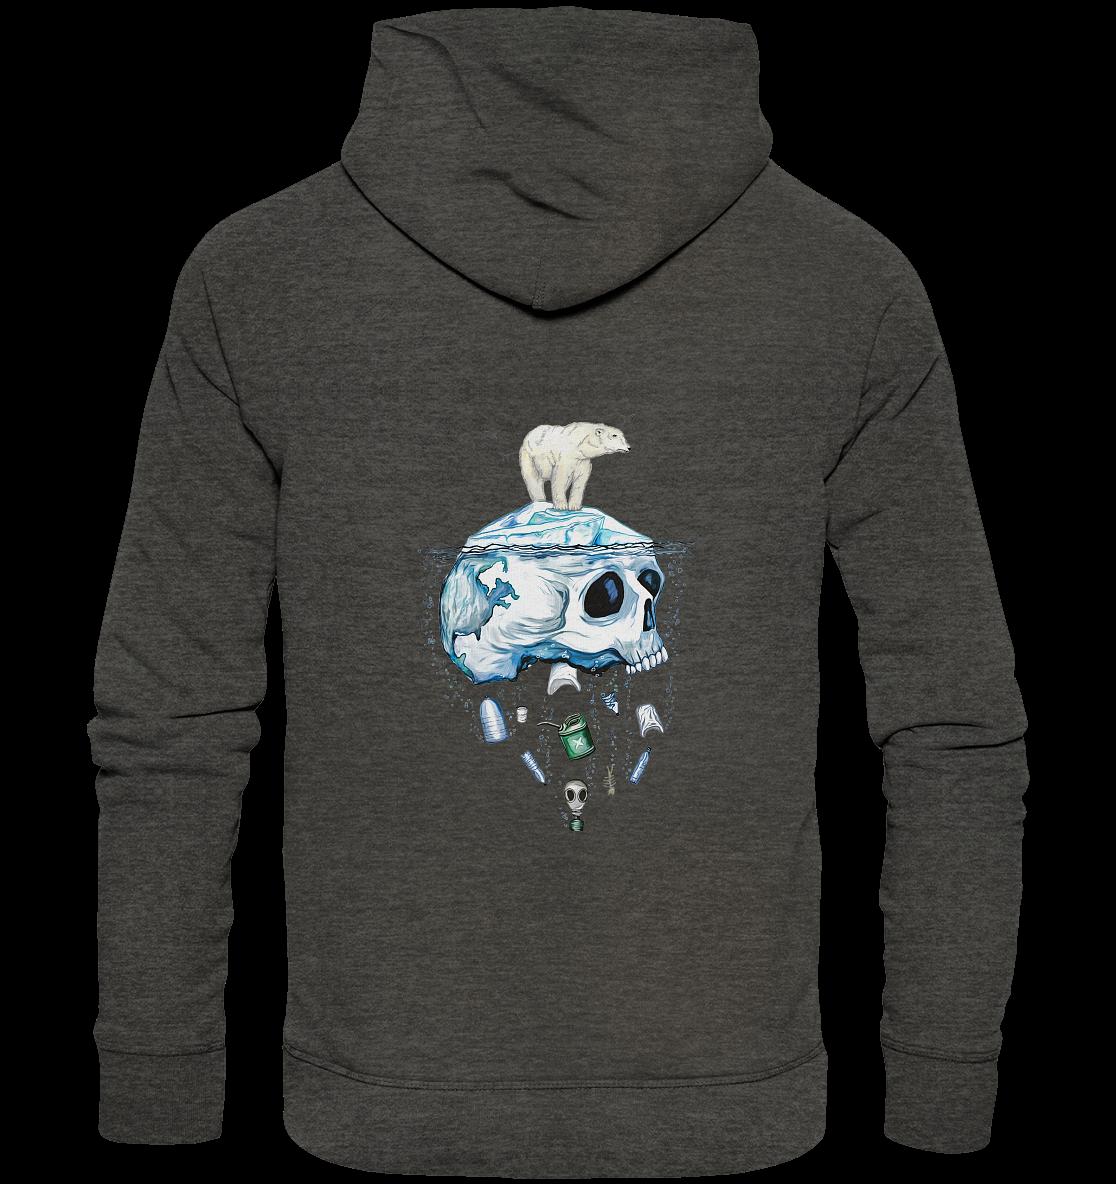 back-organic-fashion-hoodie-252625-1116x.png